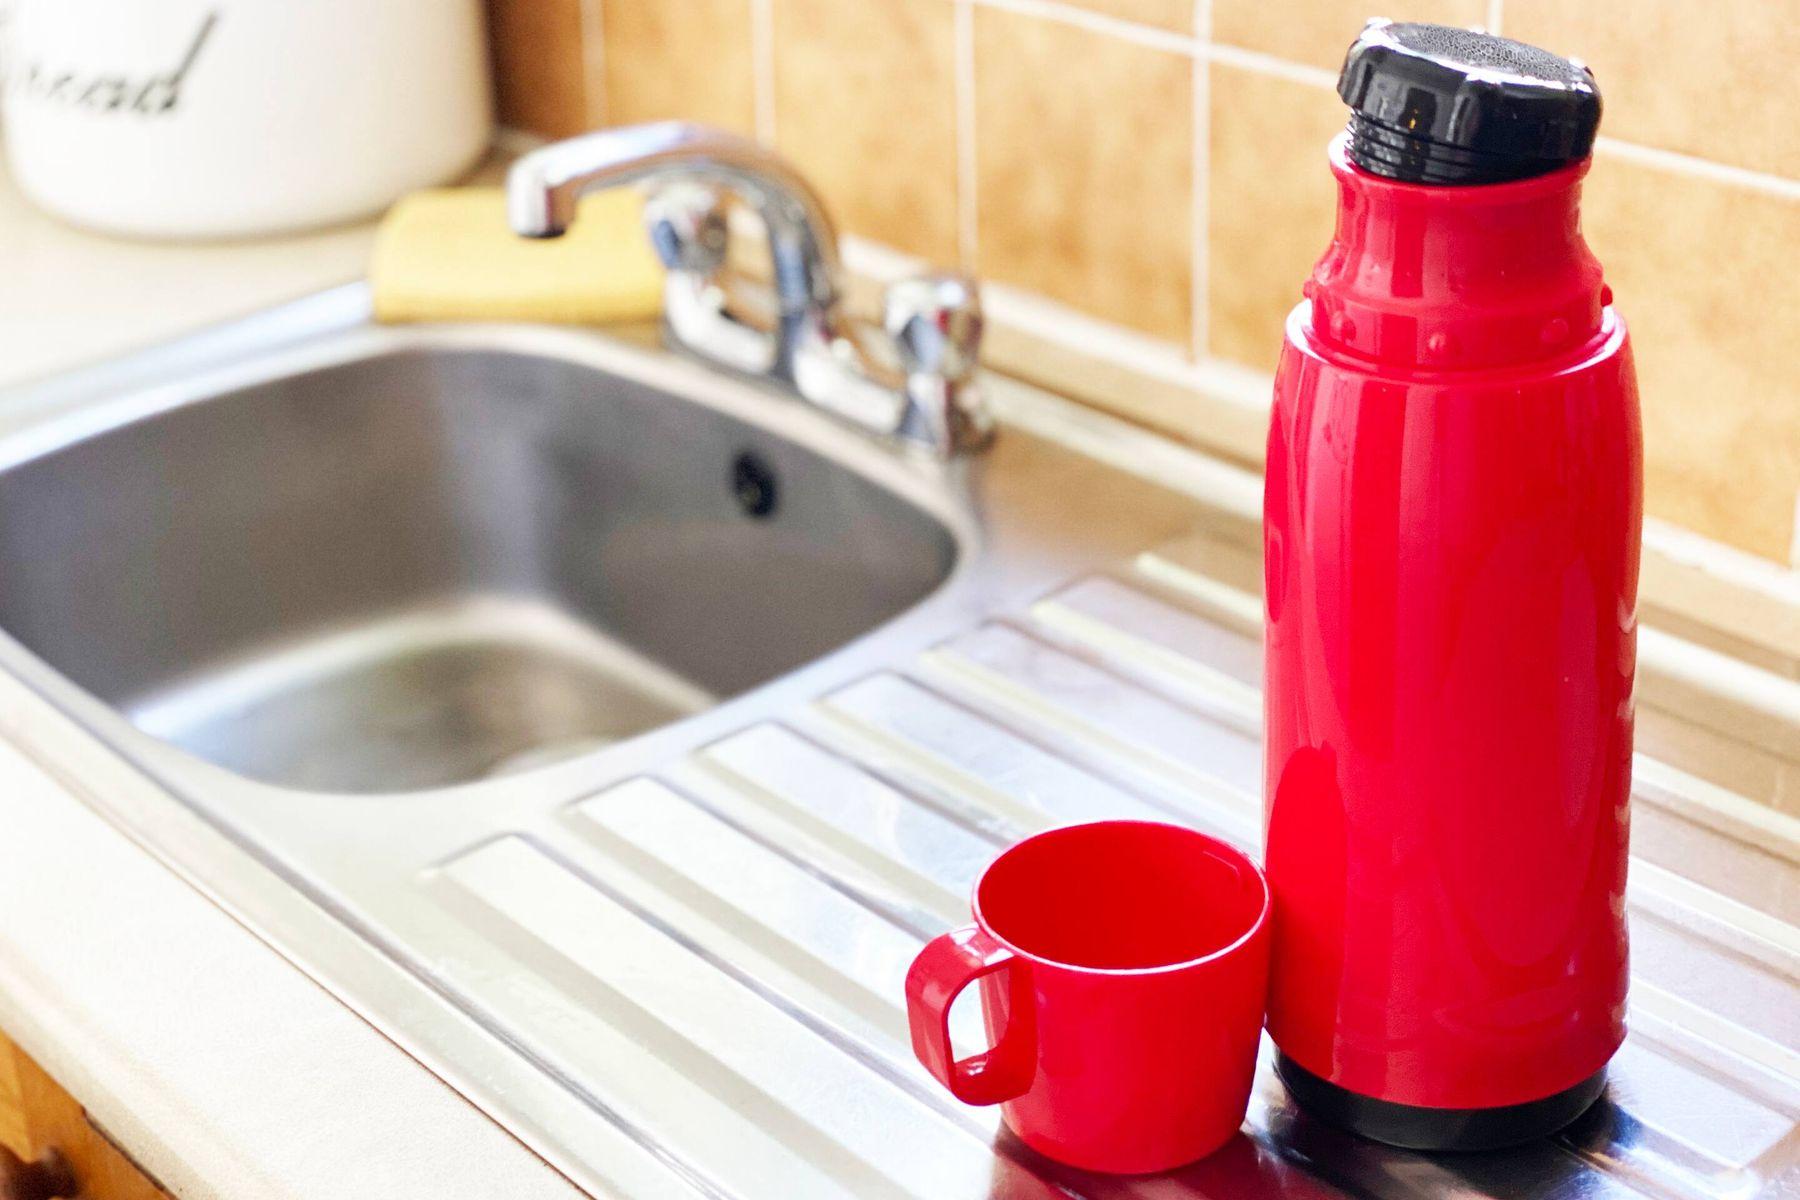 A flask beside a kitchen sink